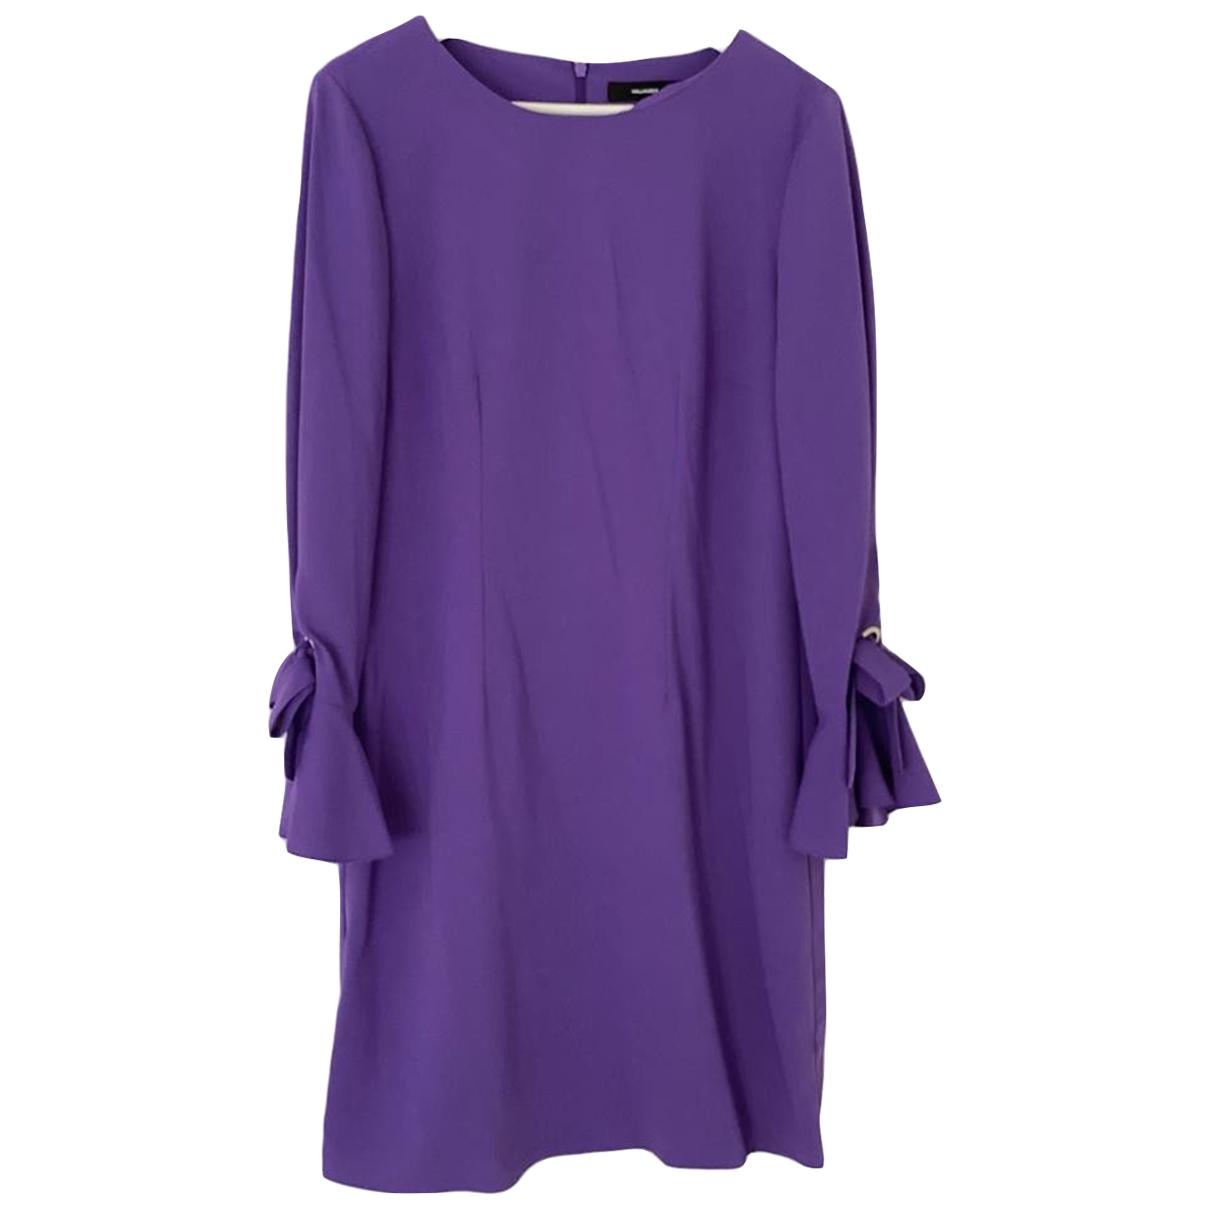 Hallhuber \N Kleid in  Lila Polyester